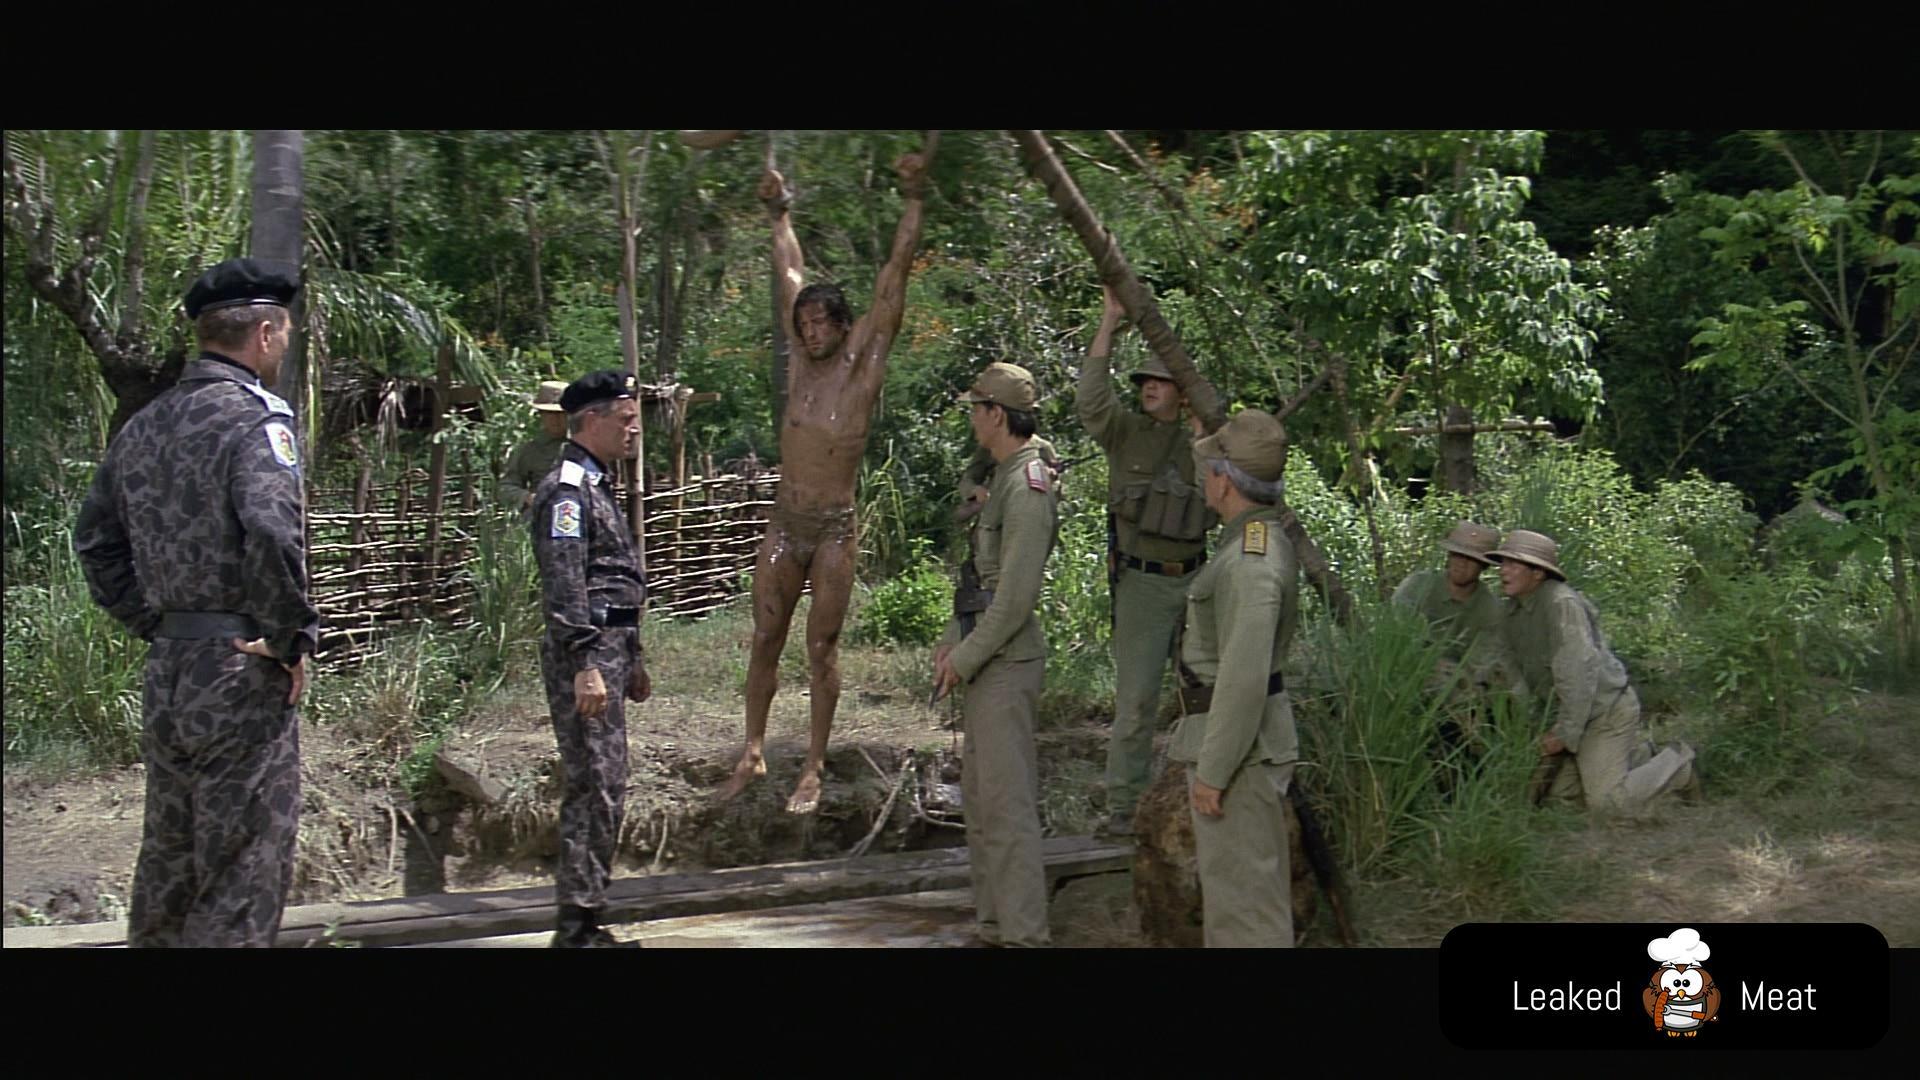 Sylvester Stallone | LeakedMeat 46